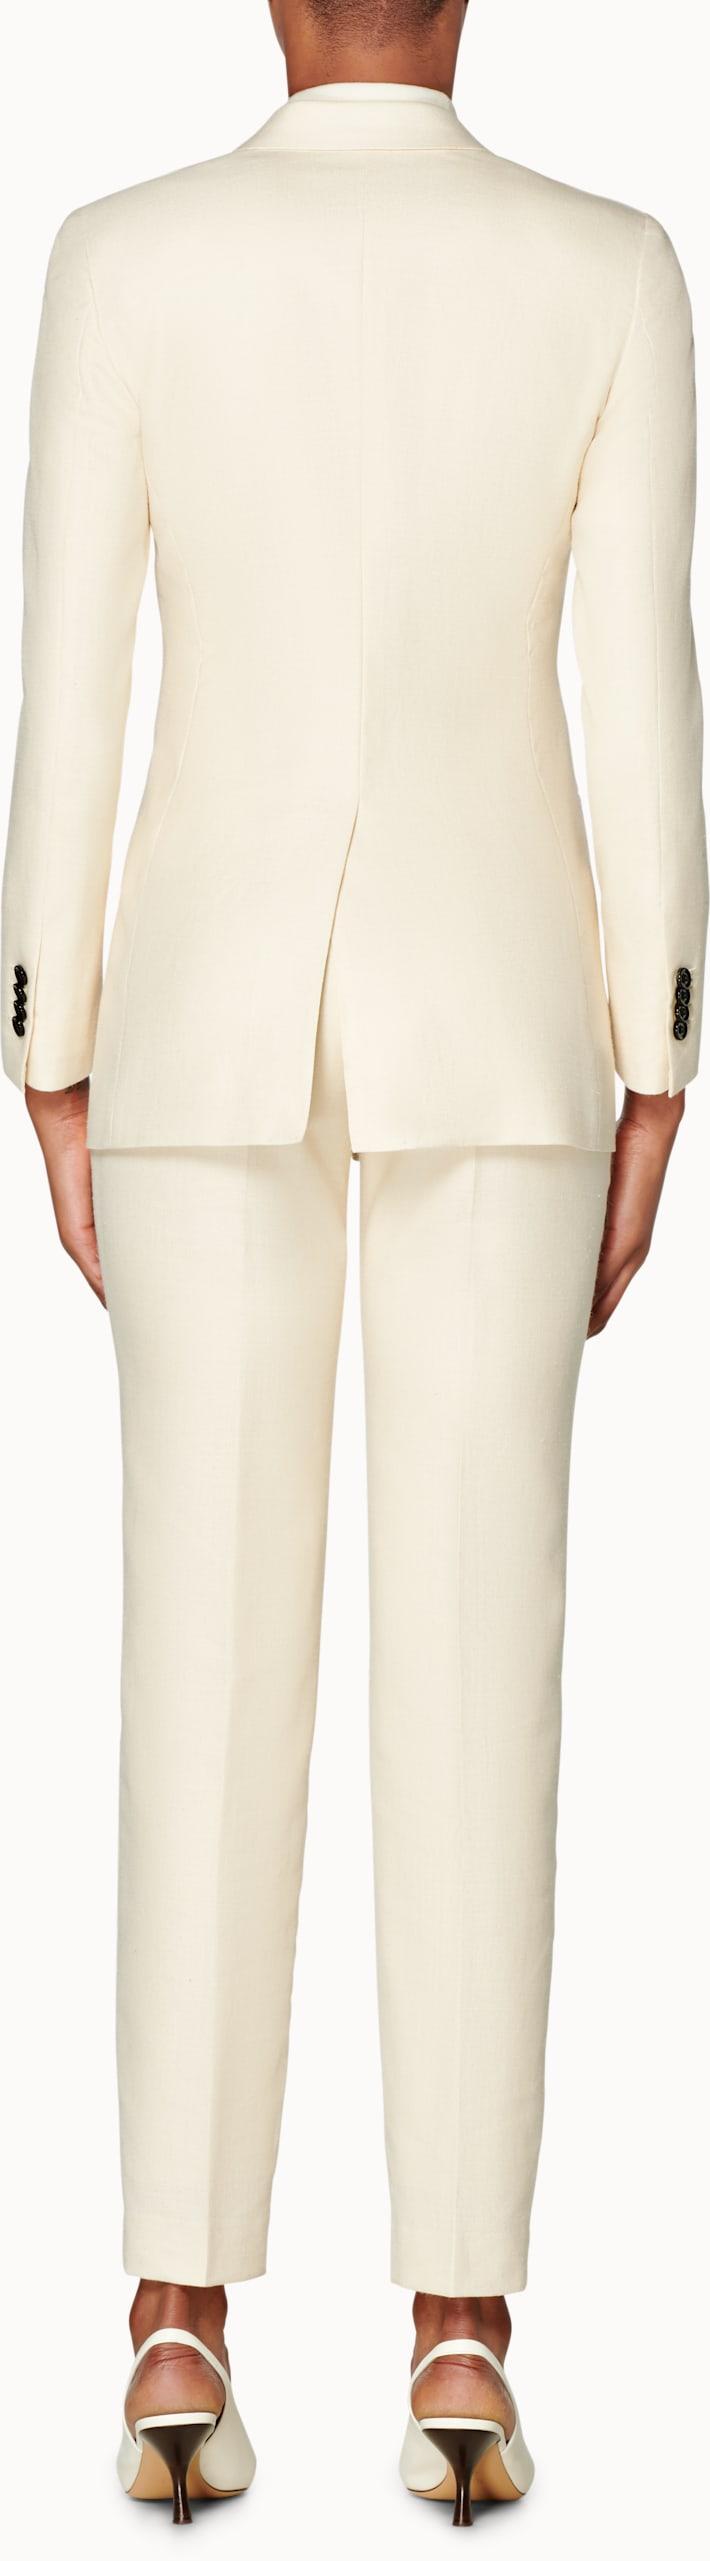 Cameron Pink Suit Suistudio Sale Latest Cheap Sale Lowest Price hXVdt6